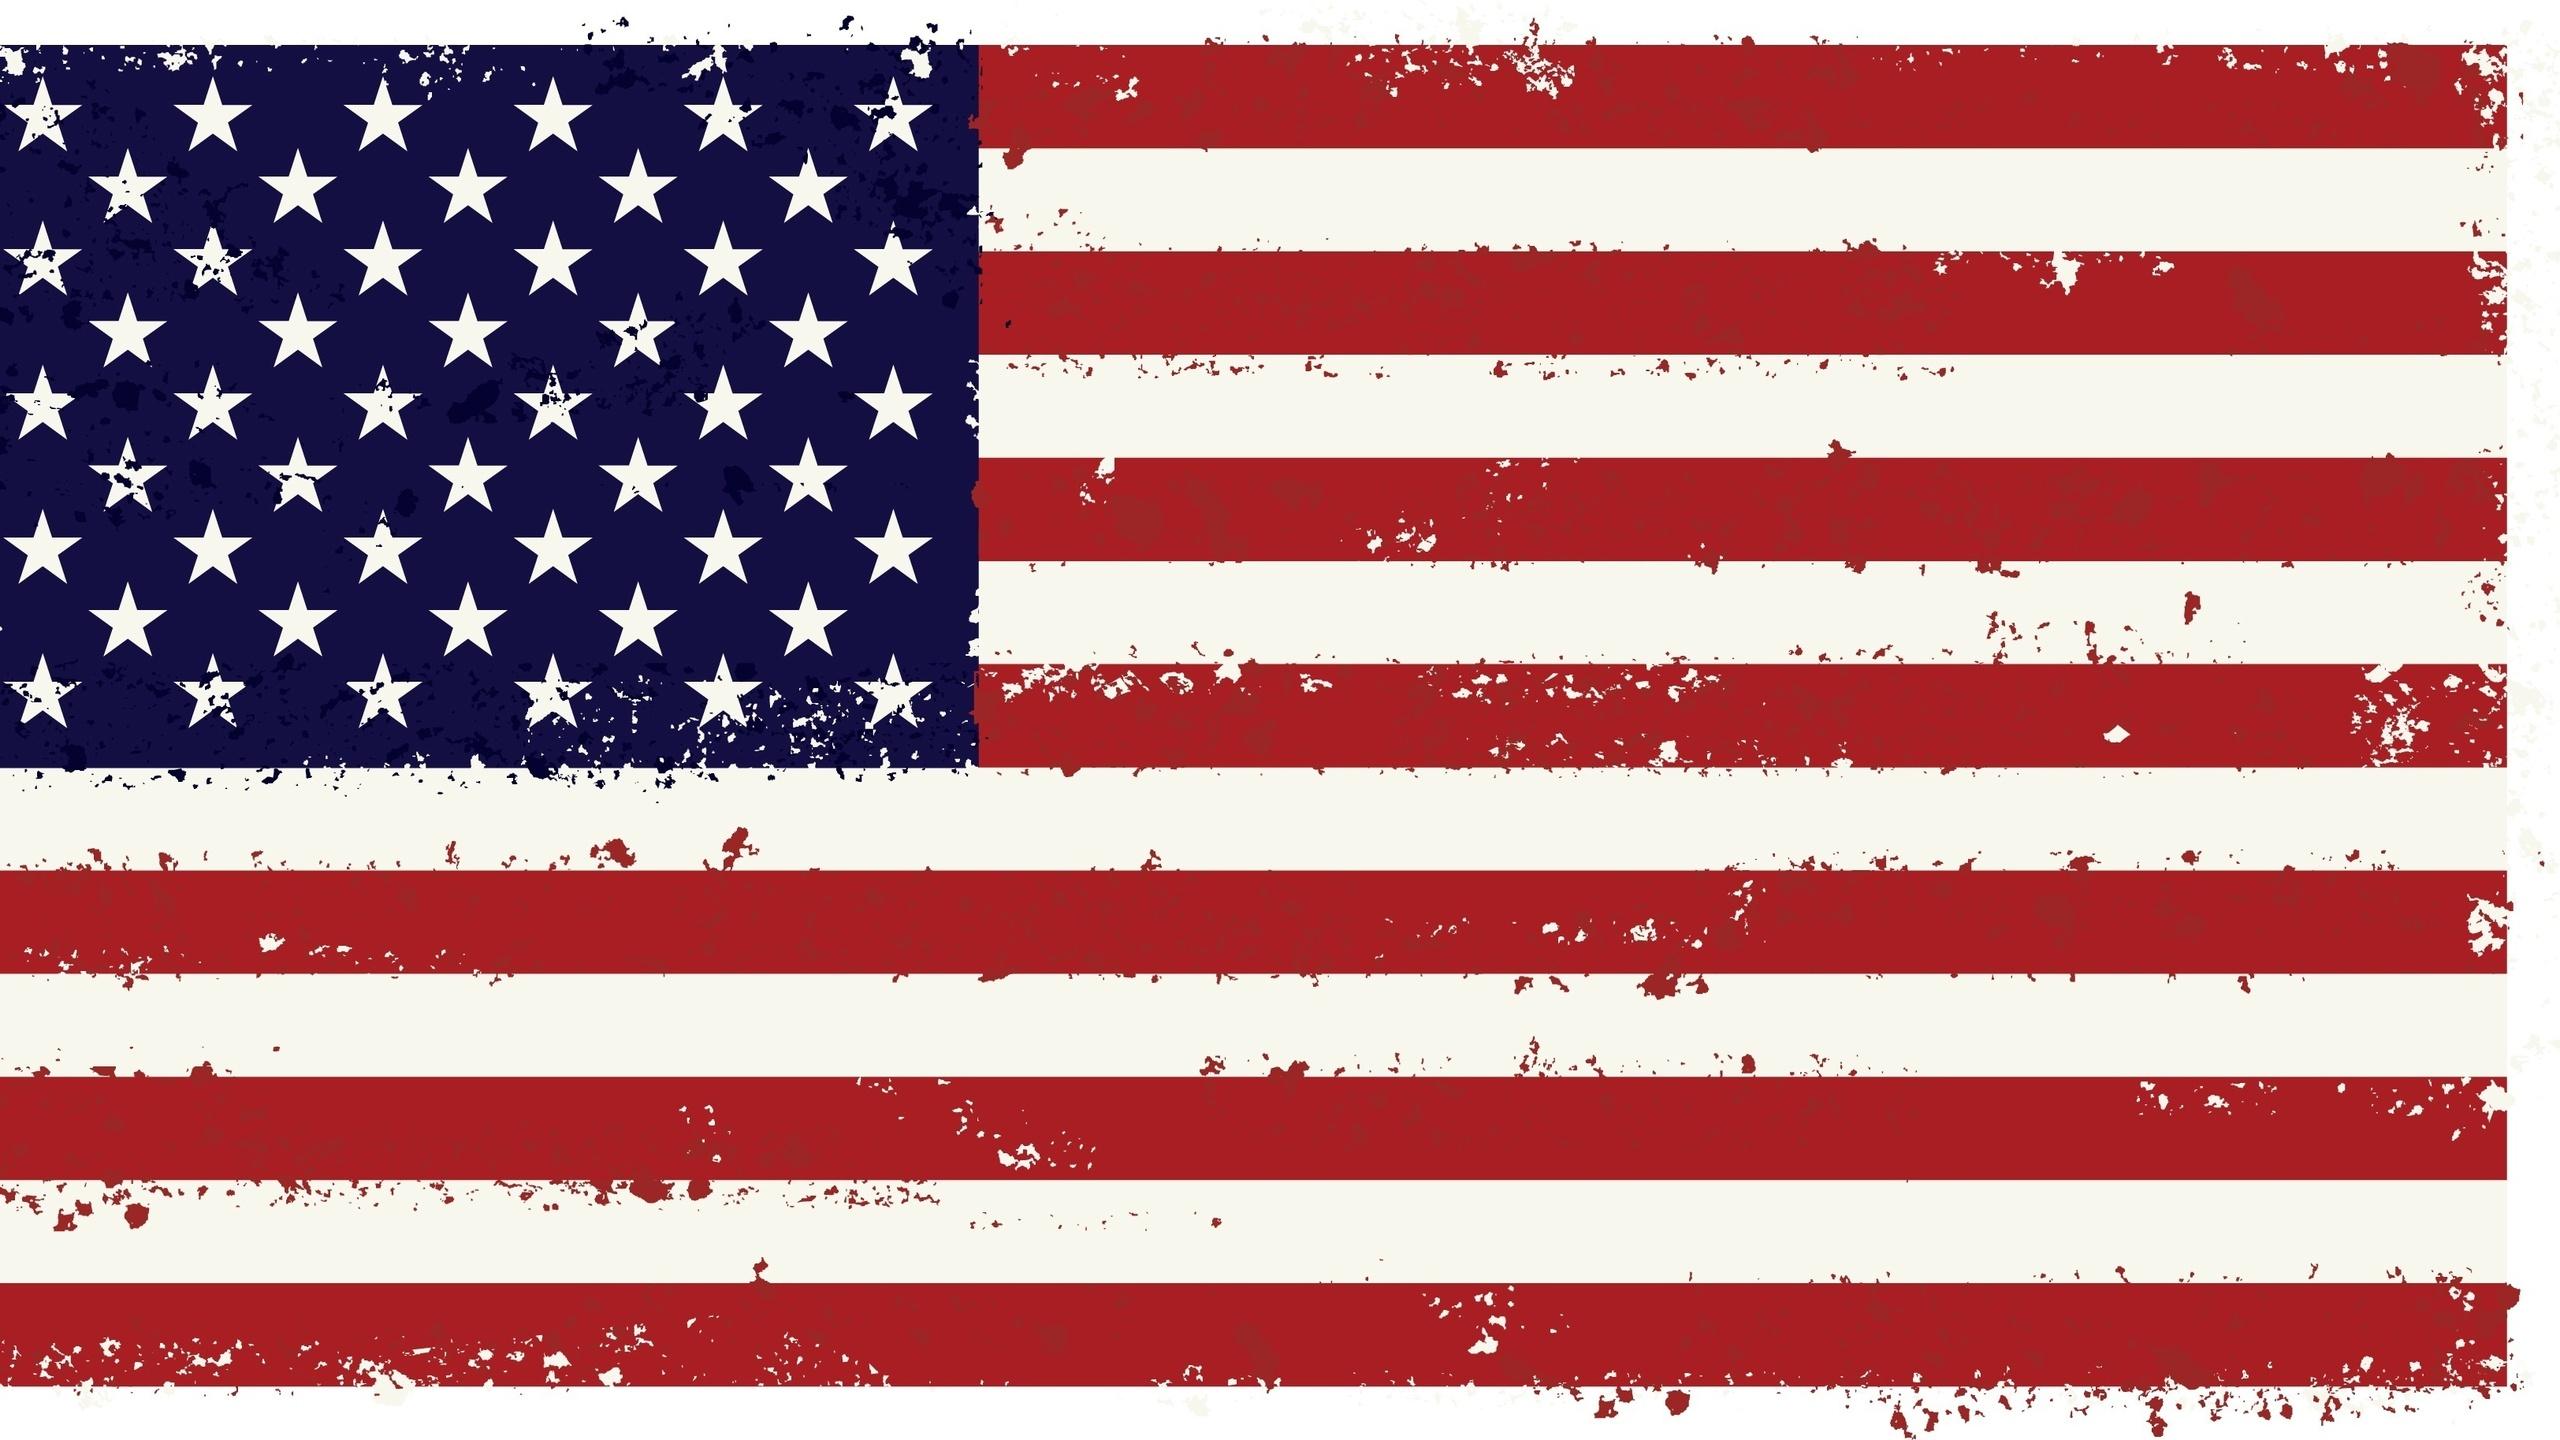 USA Flag Background image   United States of America   Mod DB 2560x1440